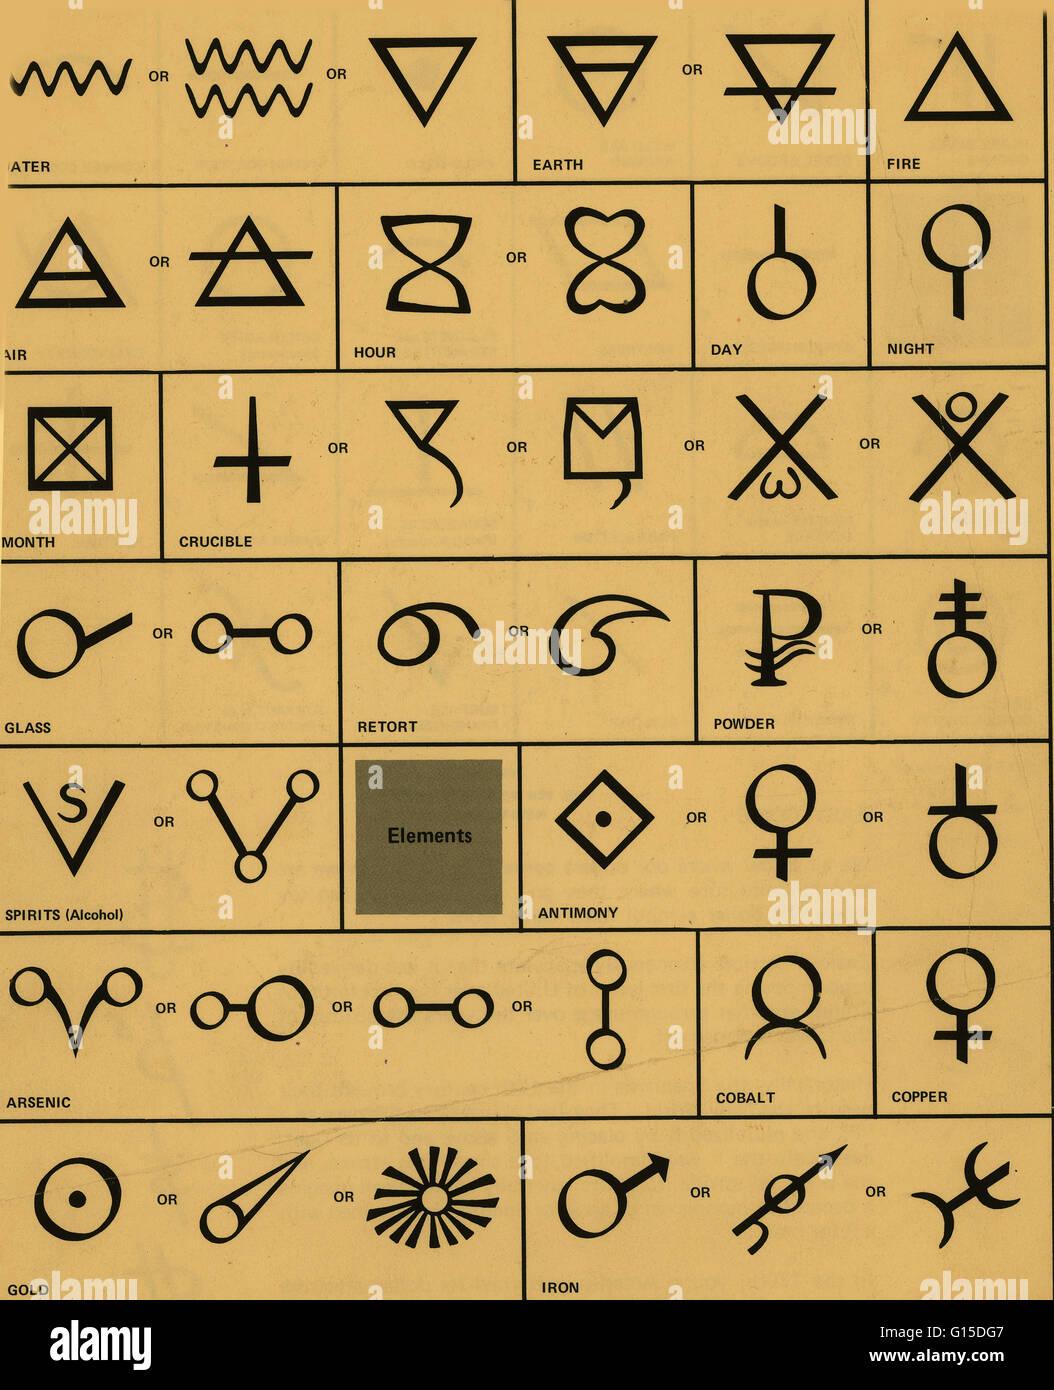 Alchemical symbol stock photos alchemical symbol stock images alchemical symbols stock image biocorpaavc